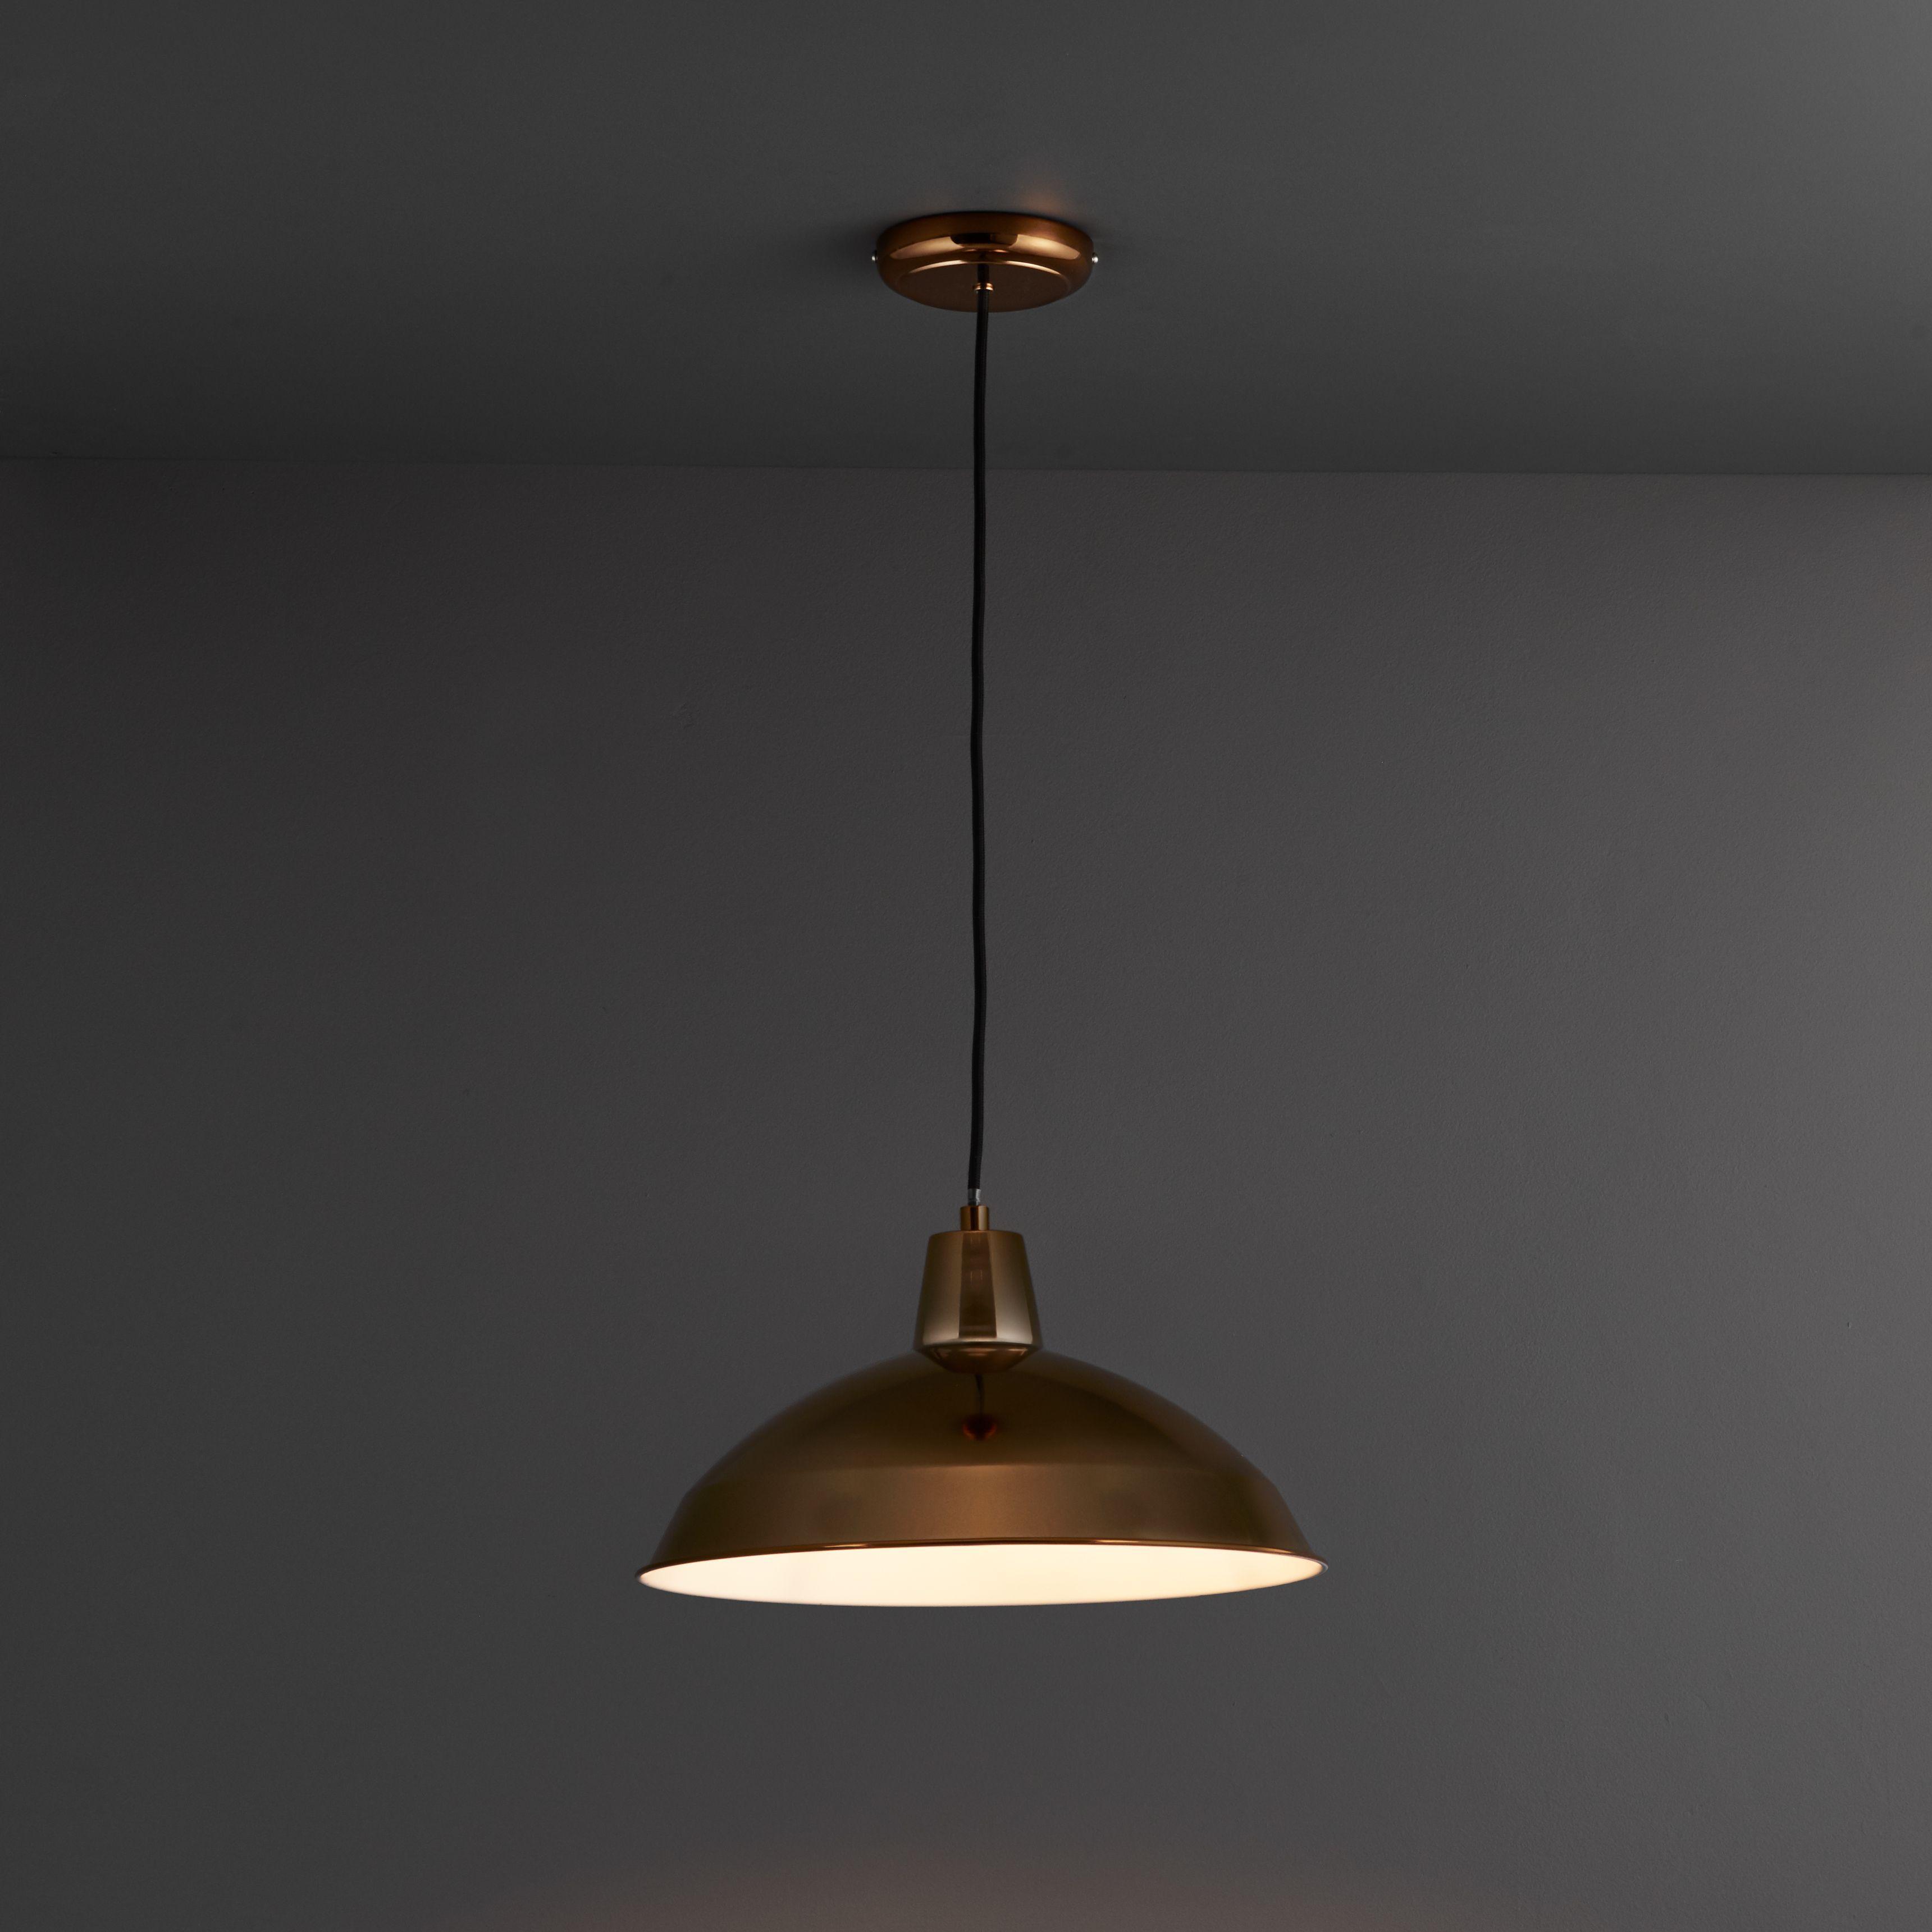 Manison Dome Copper Pendant Ceiling Light